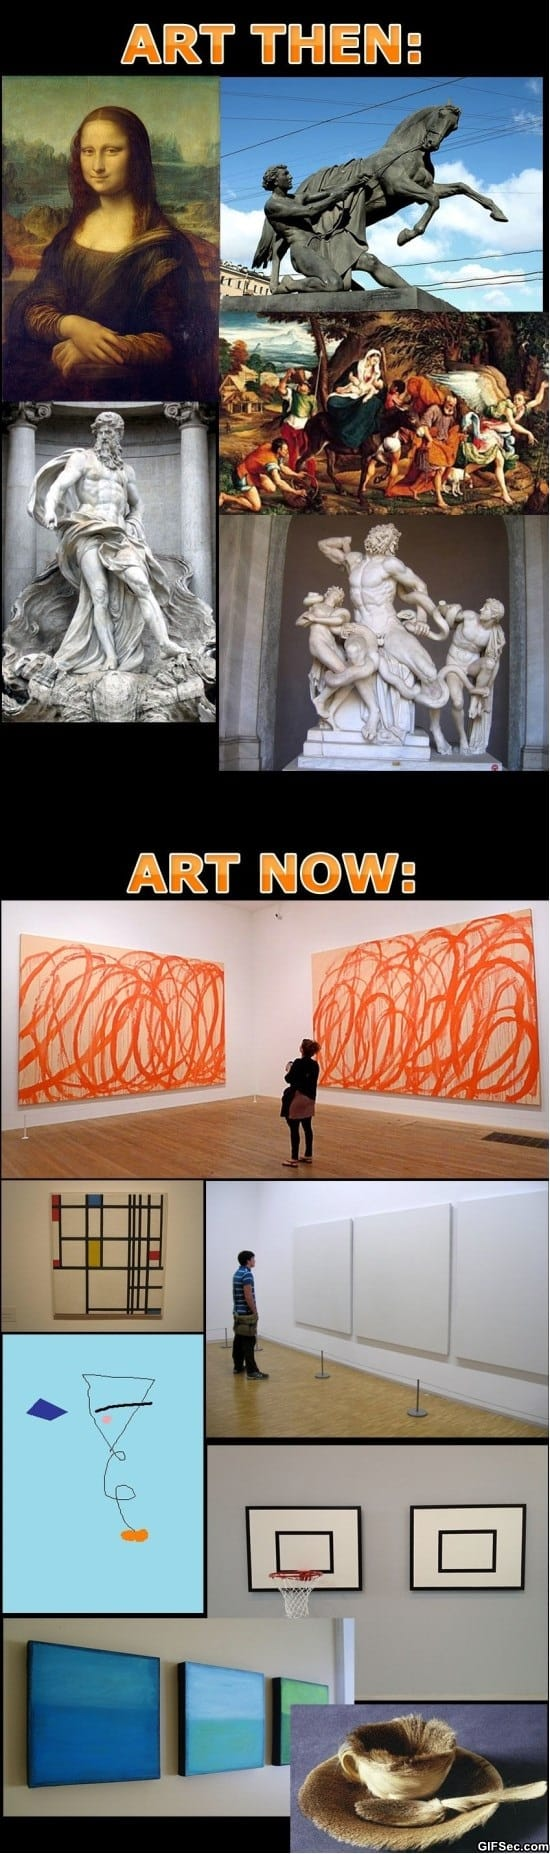 art-then-vs-art-now